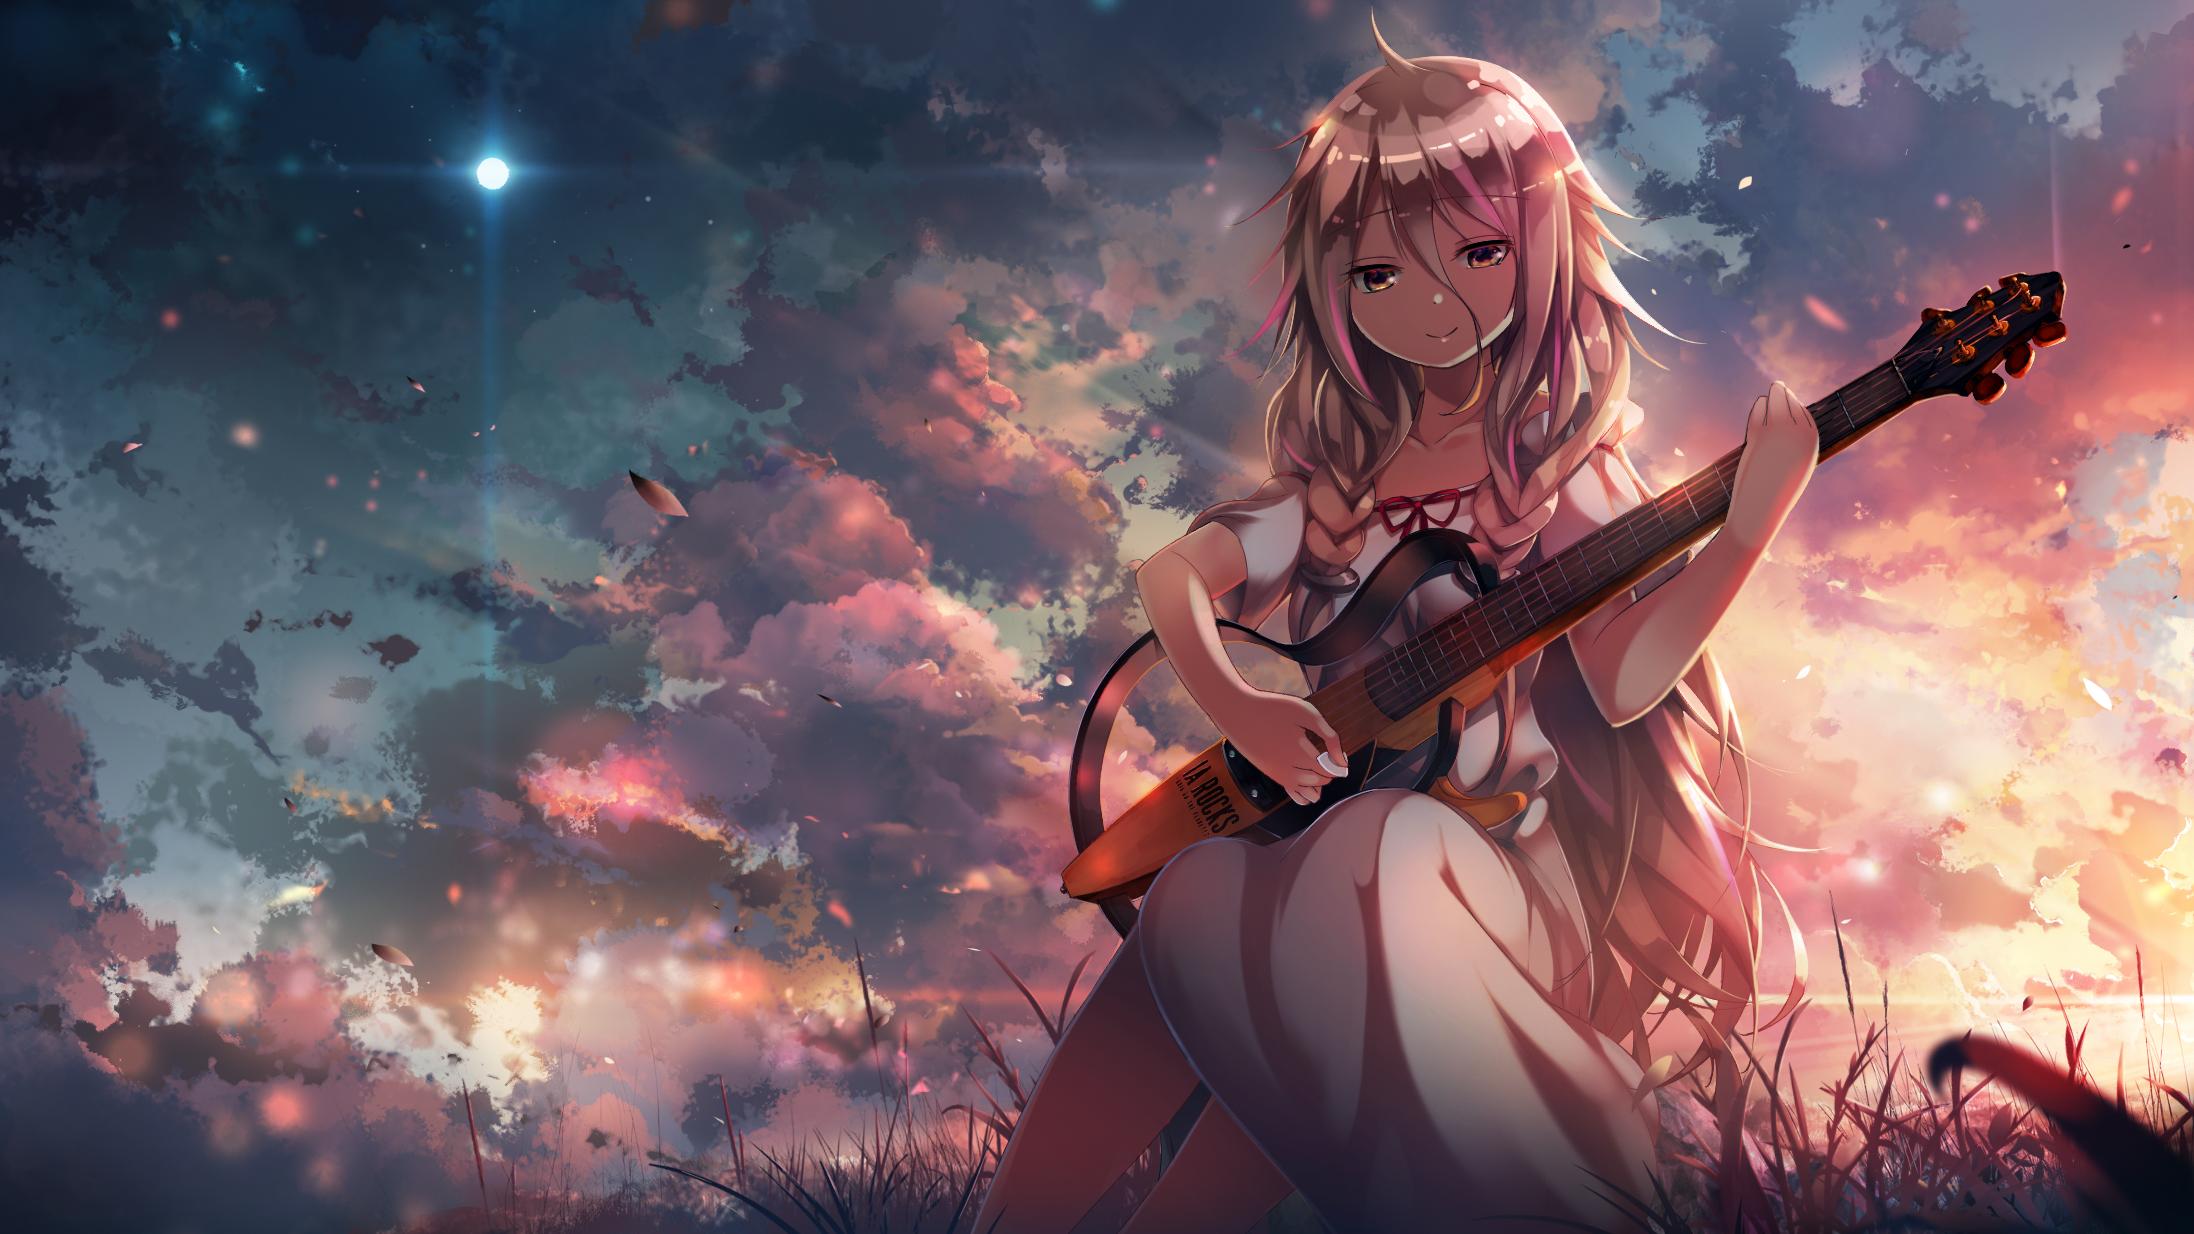 hinh nen anime girl dang yeu 3